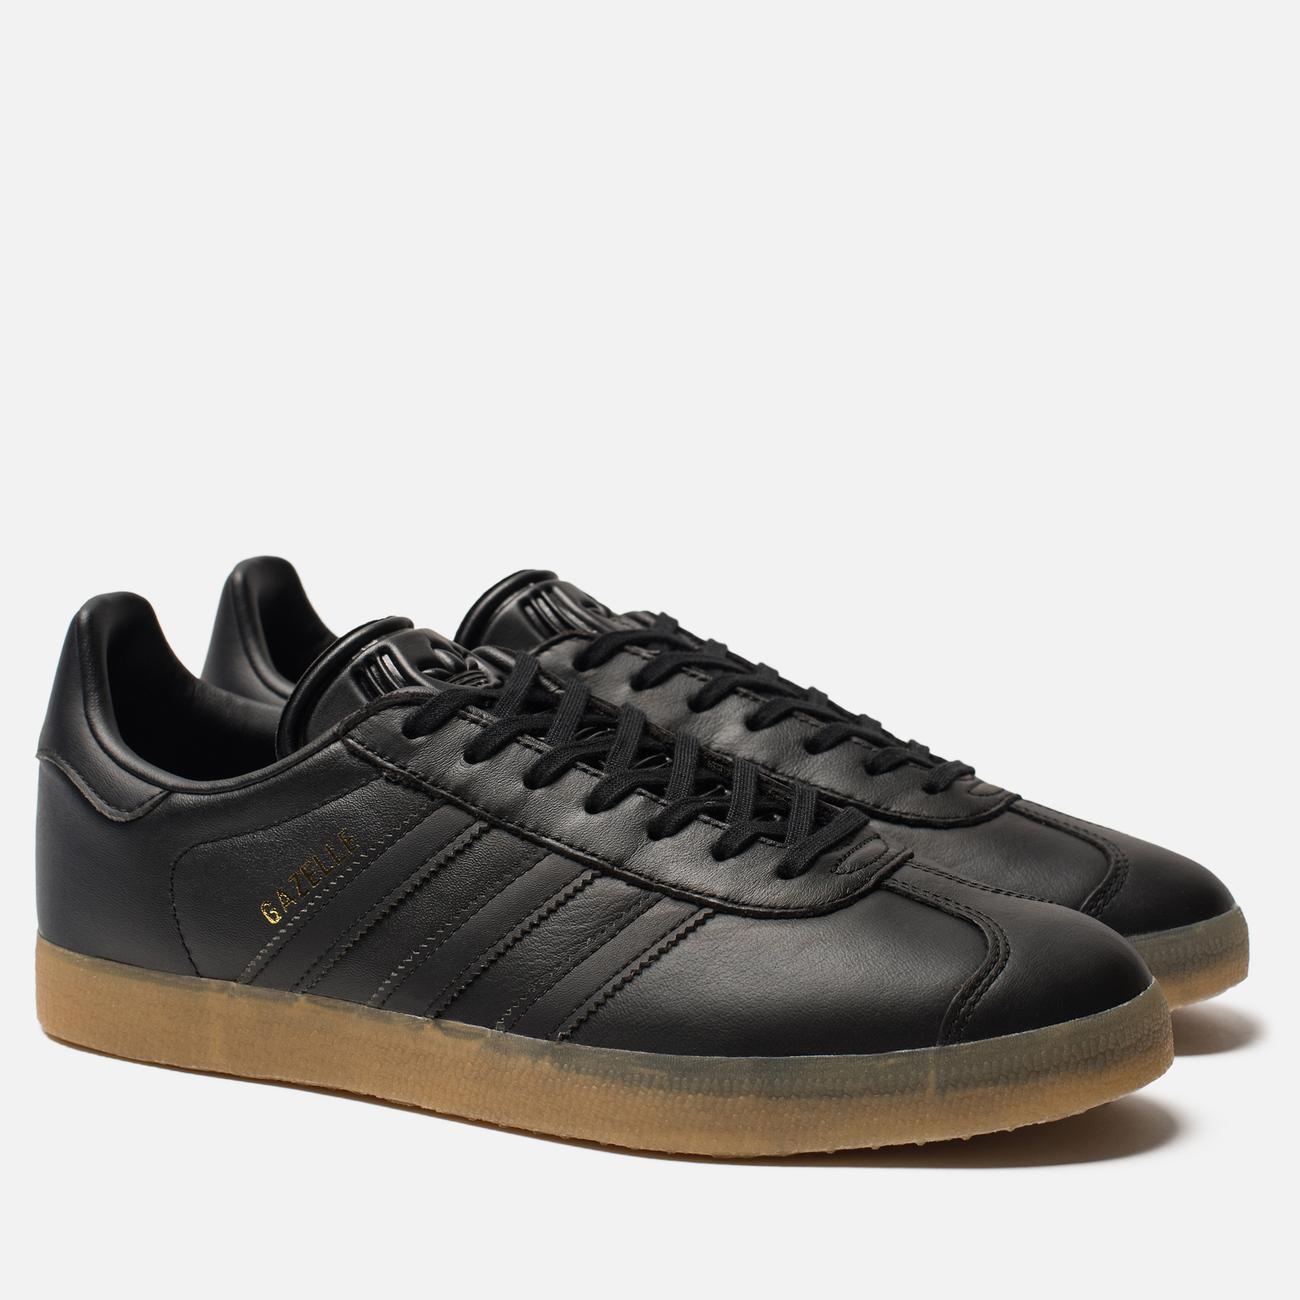 Мужские кроссовки adidas Originals Gazelle Core Black/Core Black/Gum